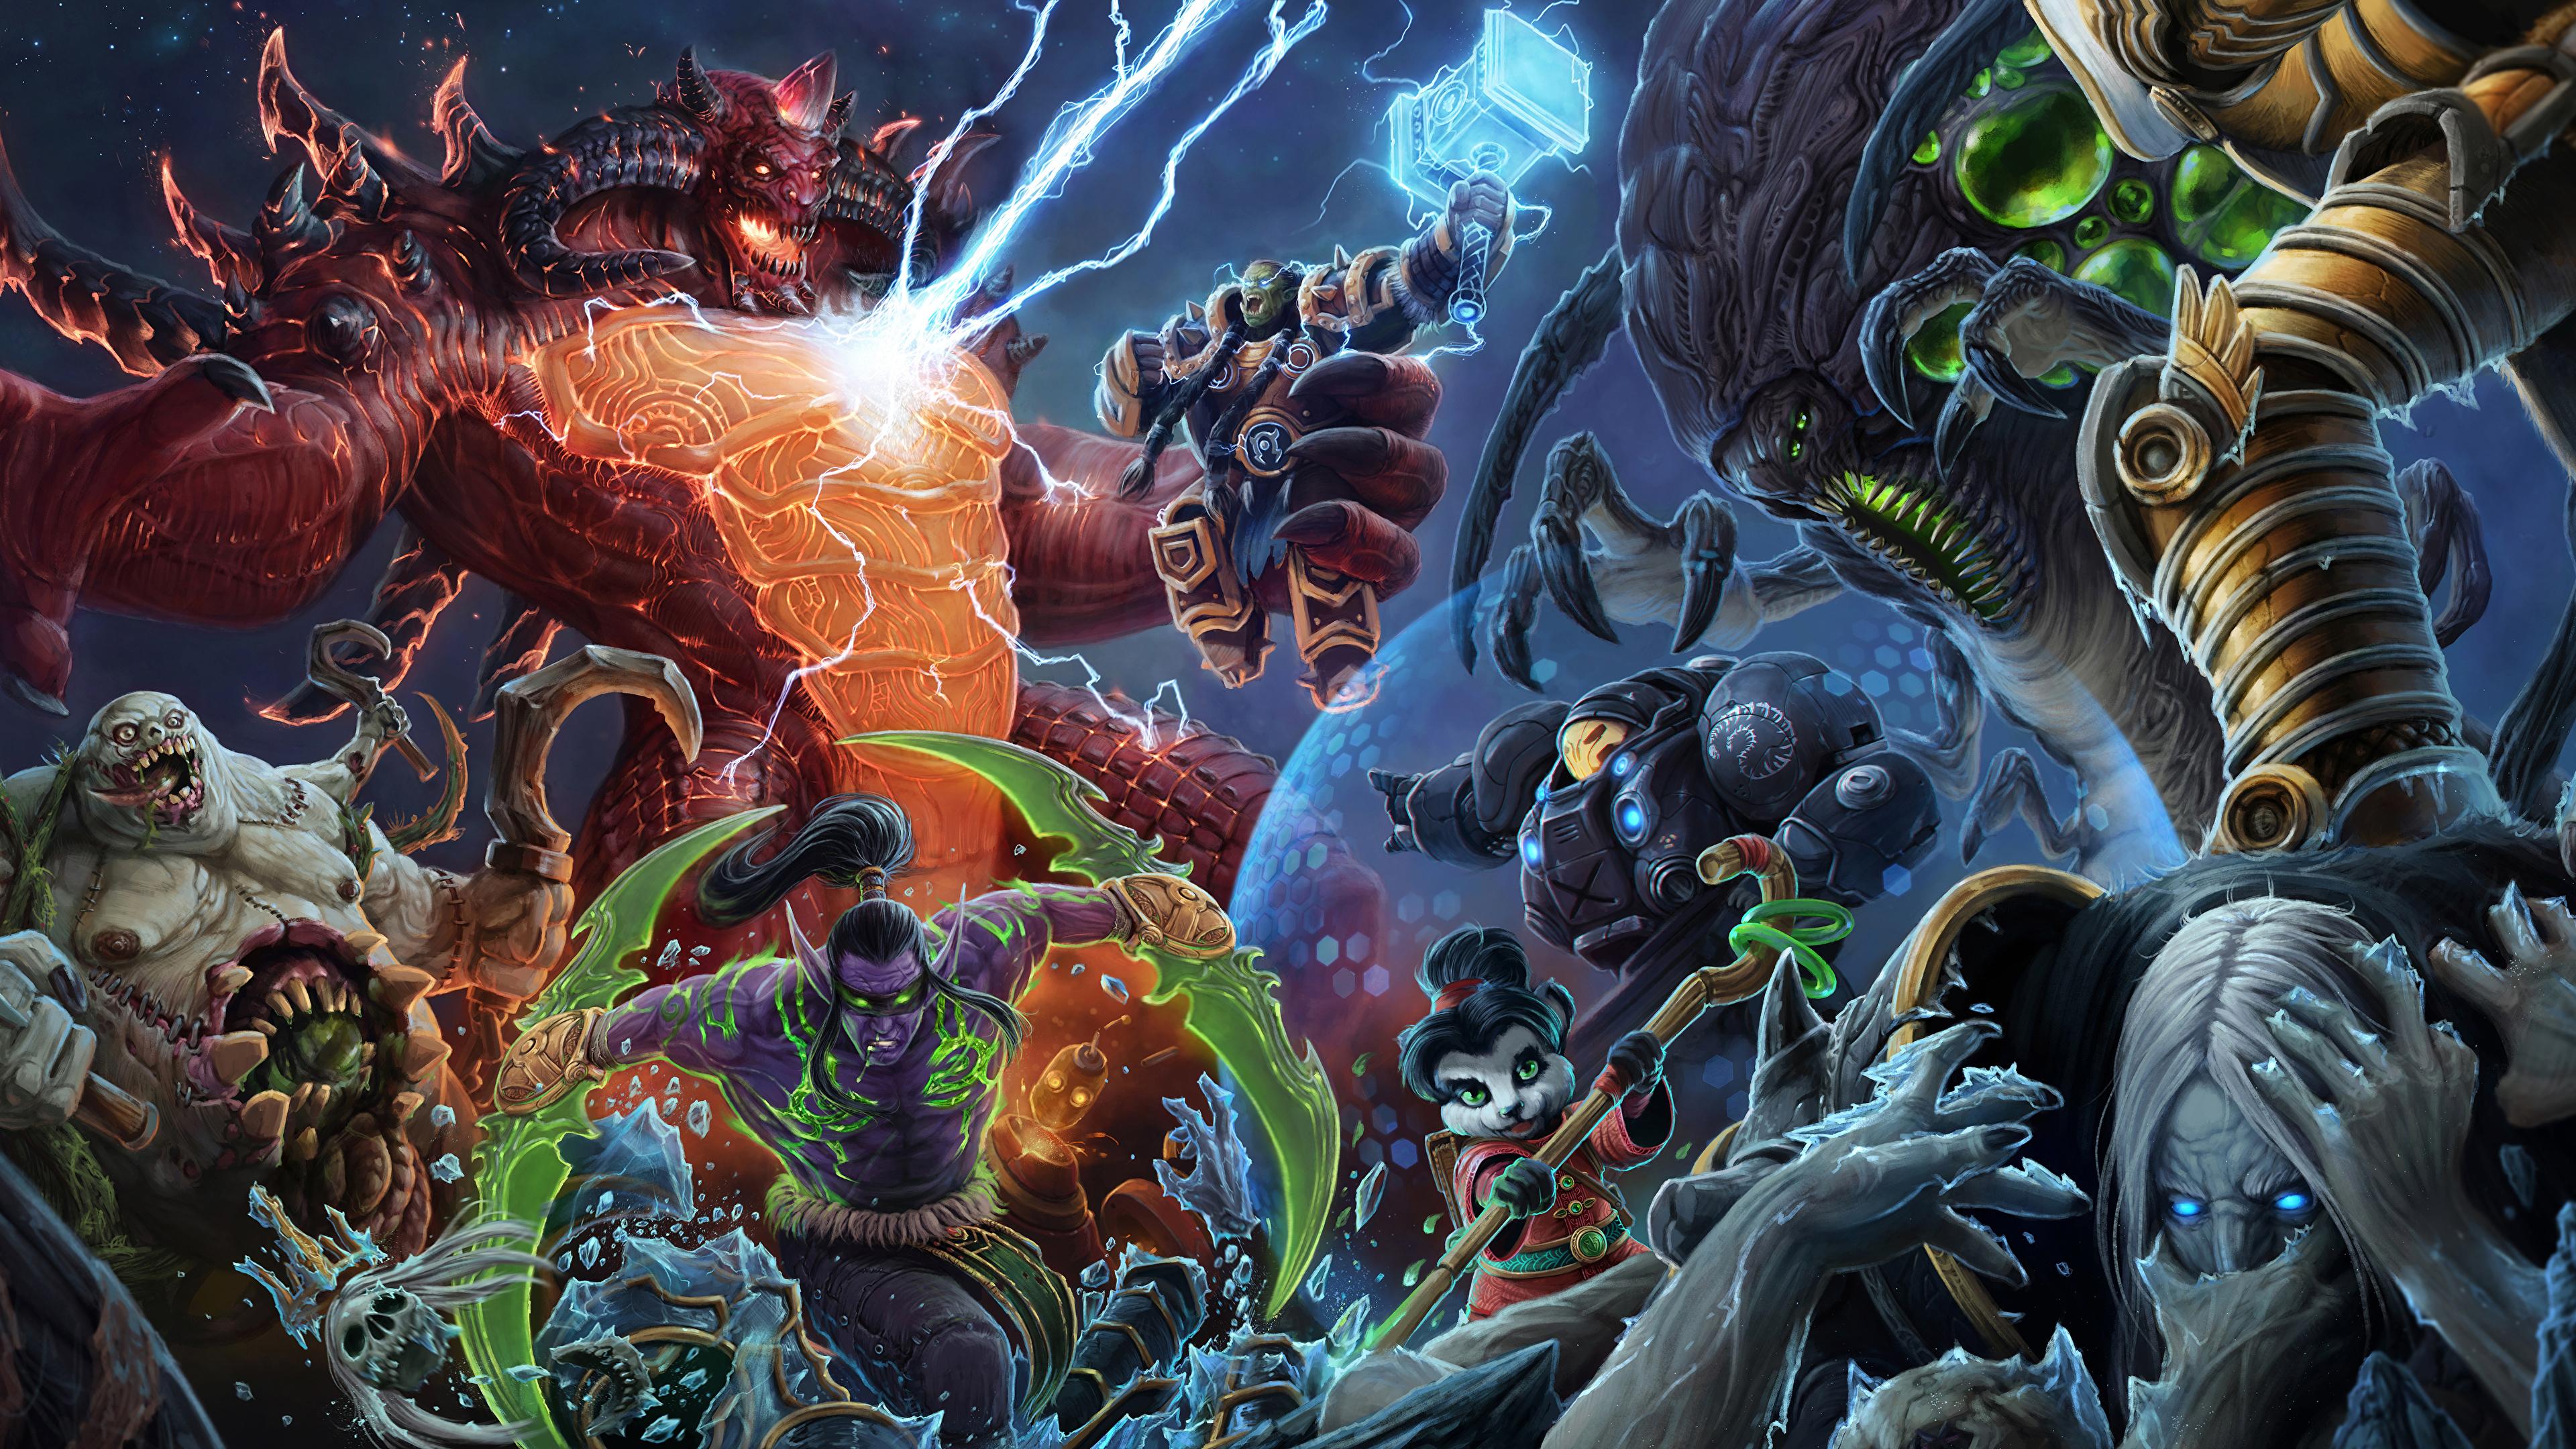 Pictures Wow Diablo Starcraft Heroes Of The Storm Warrior